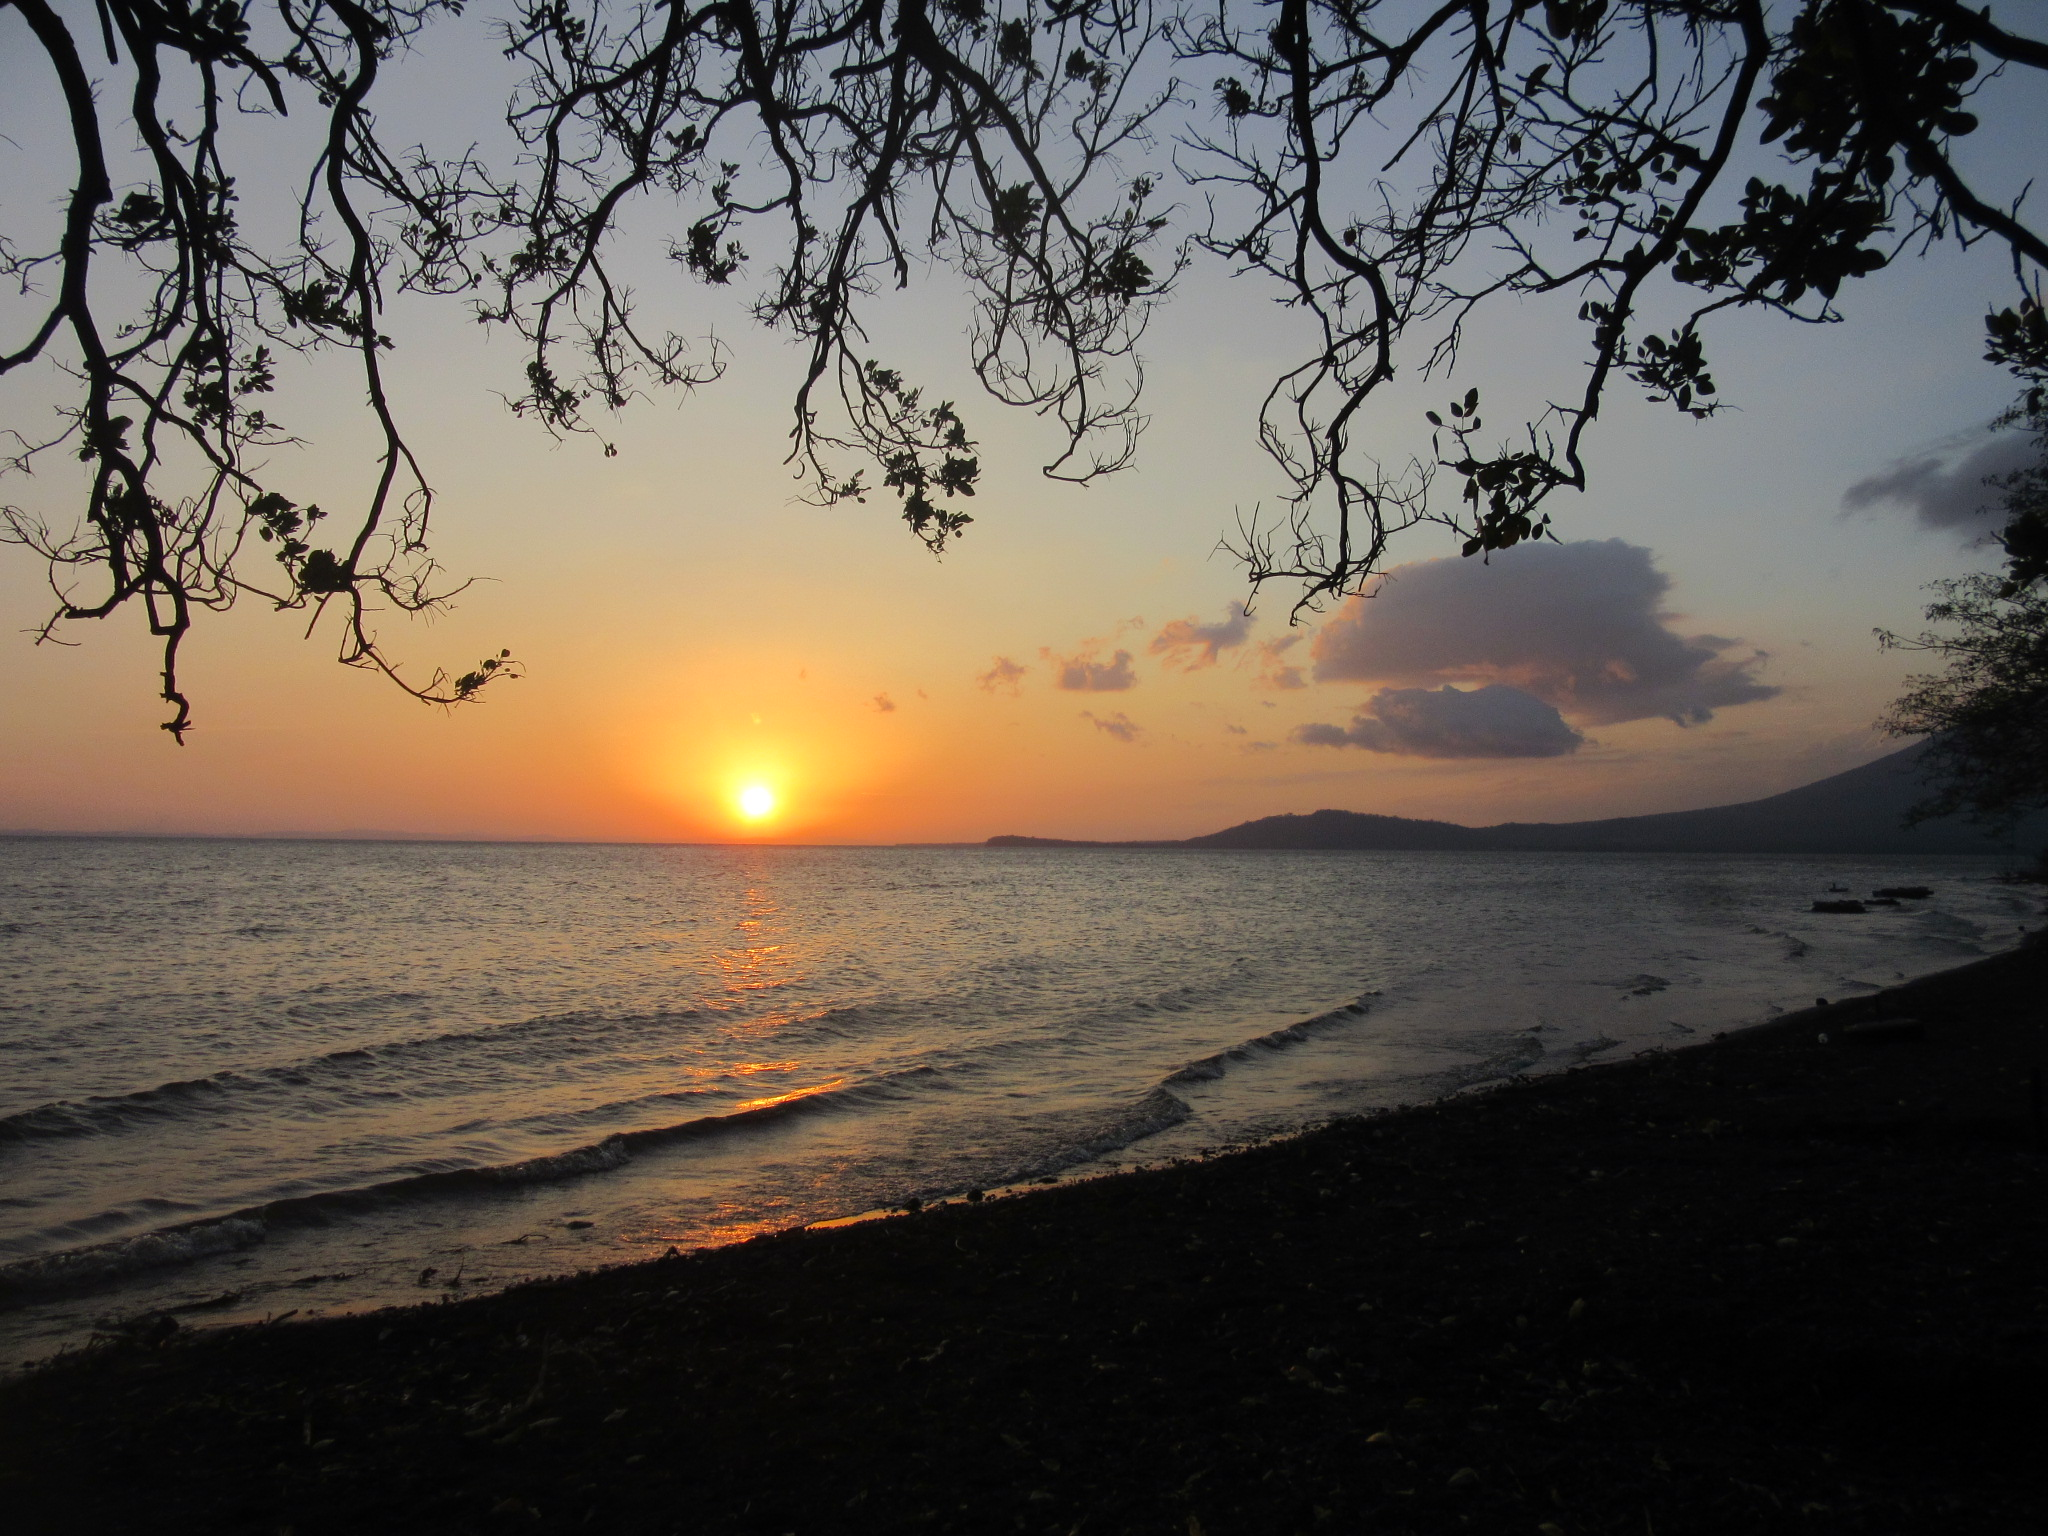 Sunset in Merida